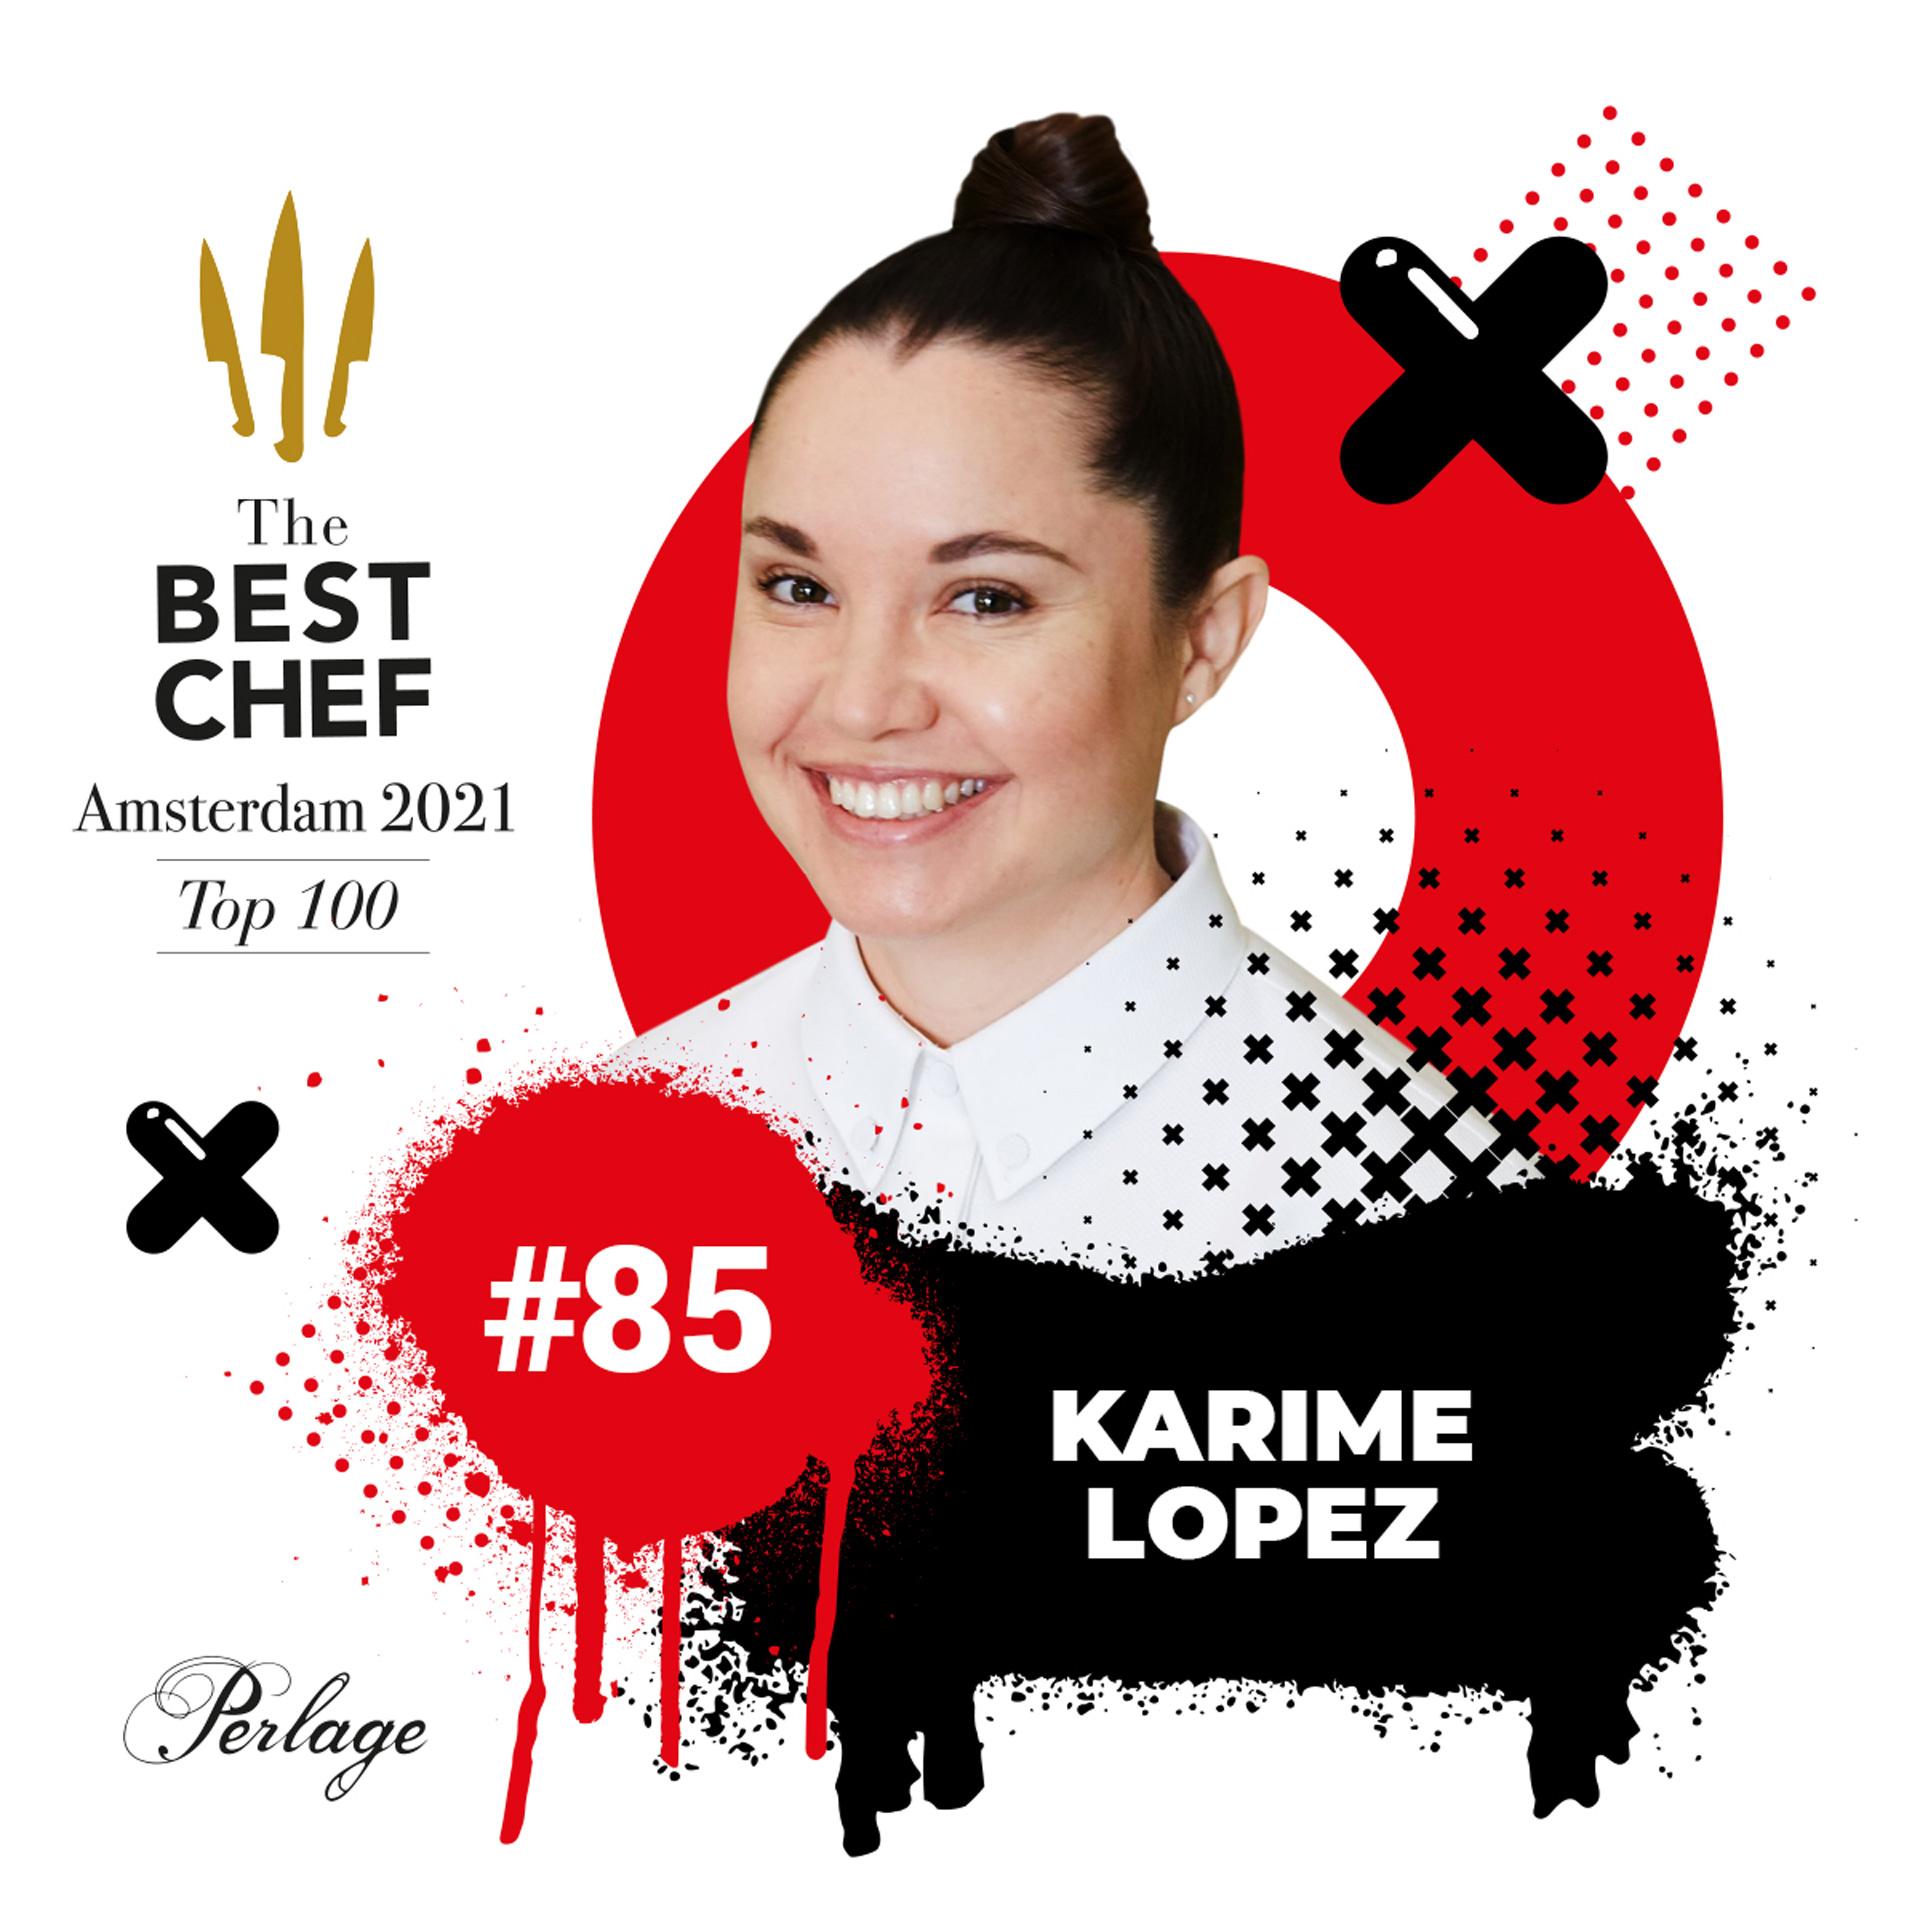 Chef Karime Lopez, numero 85 de The Best Chef Awards